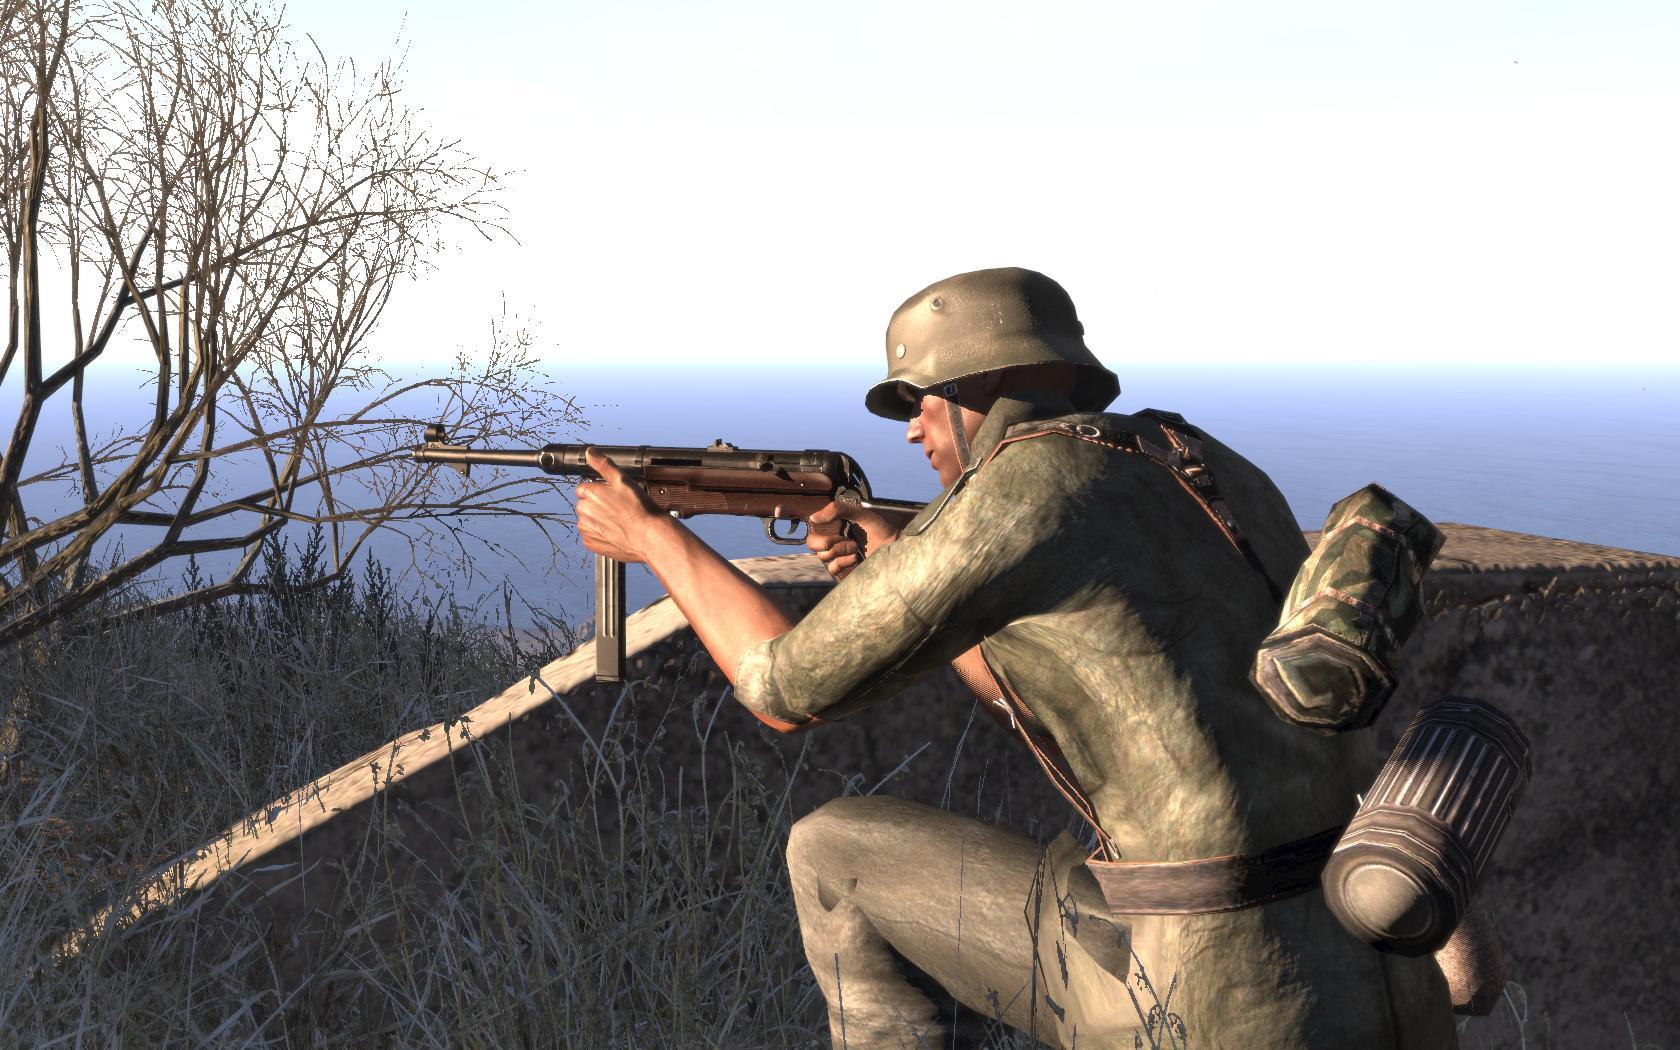 Invasion 1944 v3 mod for ARMA 3 - Mod DB